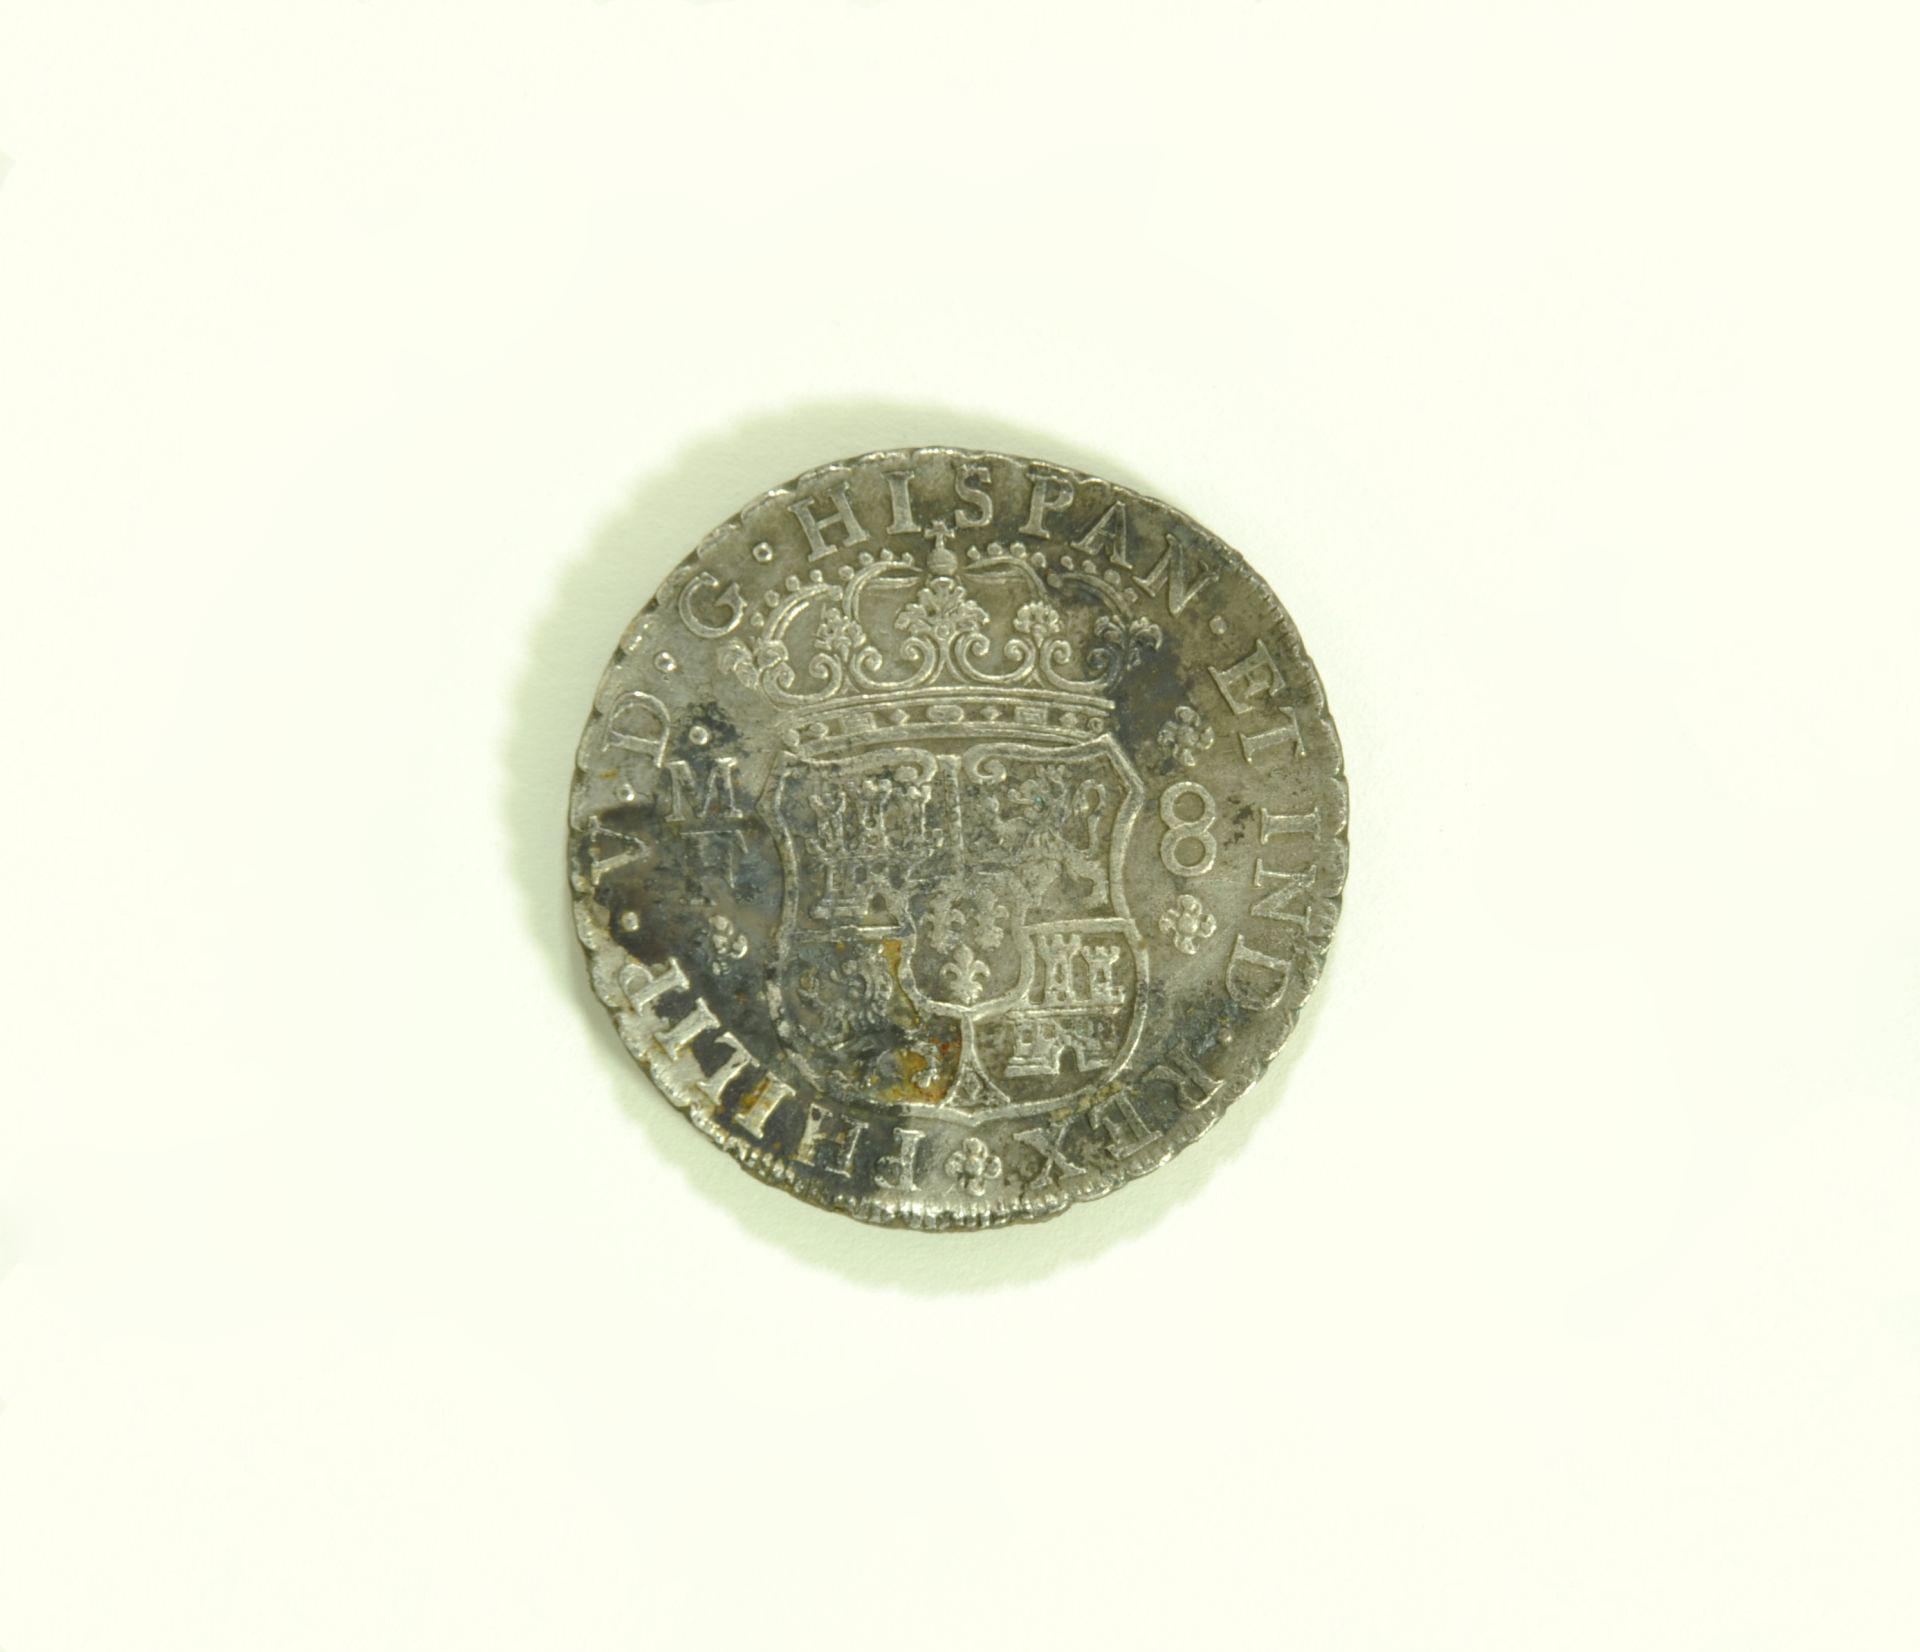 Reaal van 8, 'Pillar Dollar'. Spanje 1737